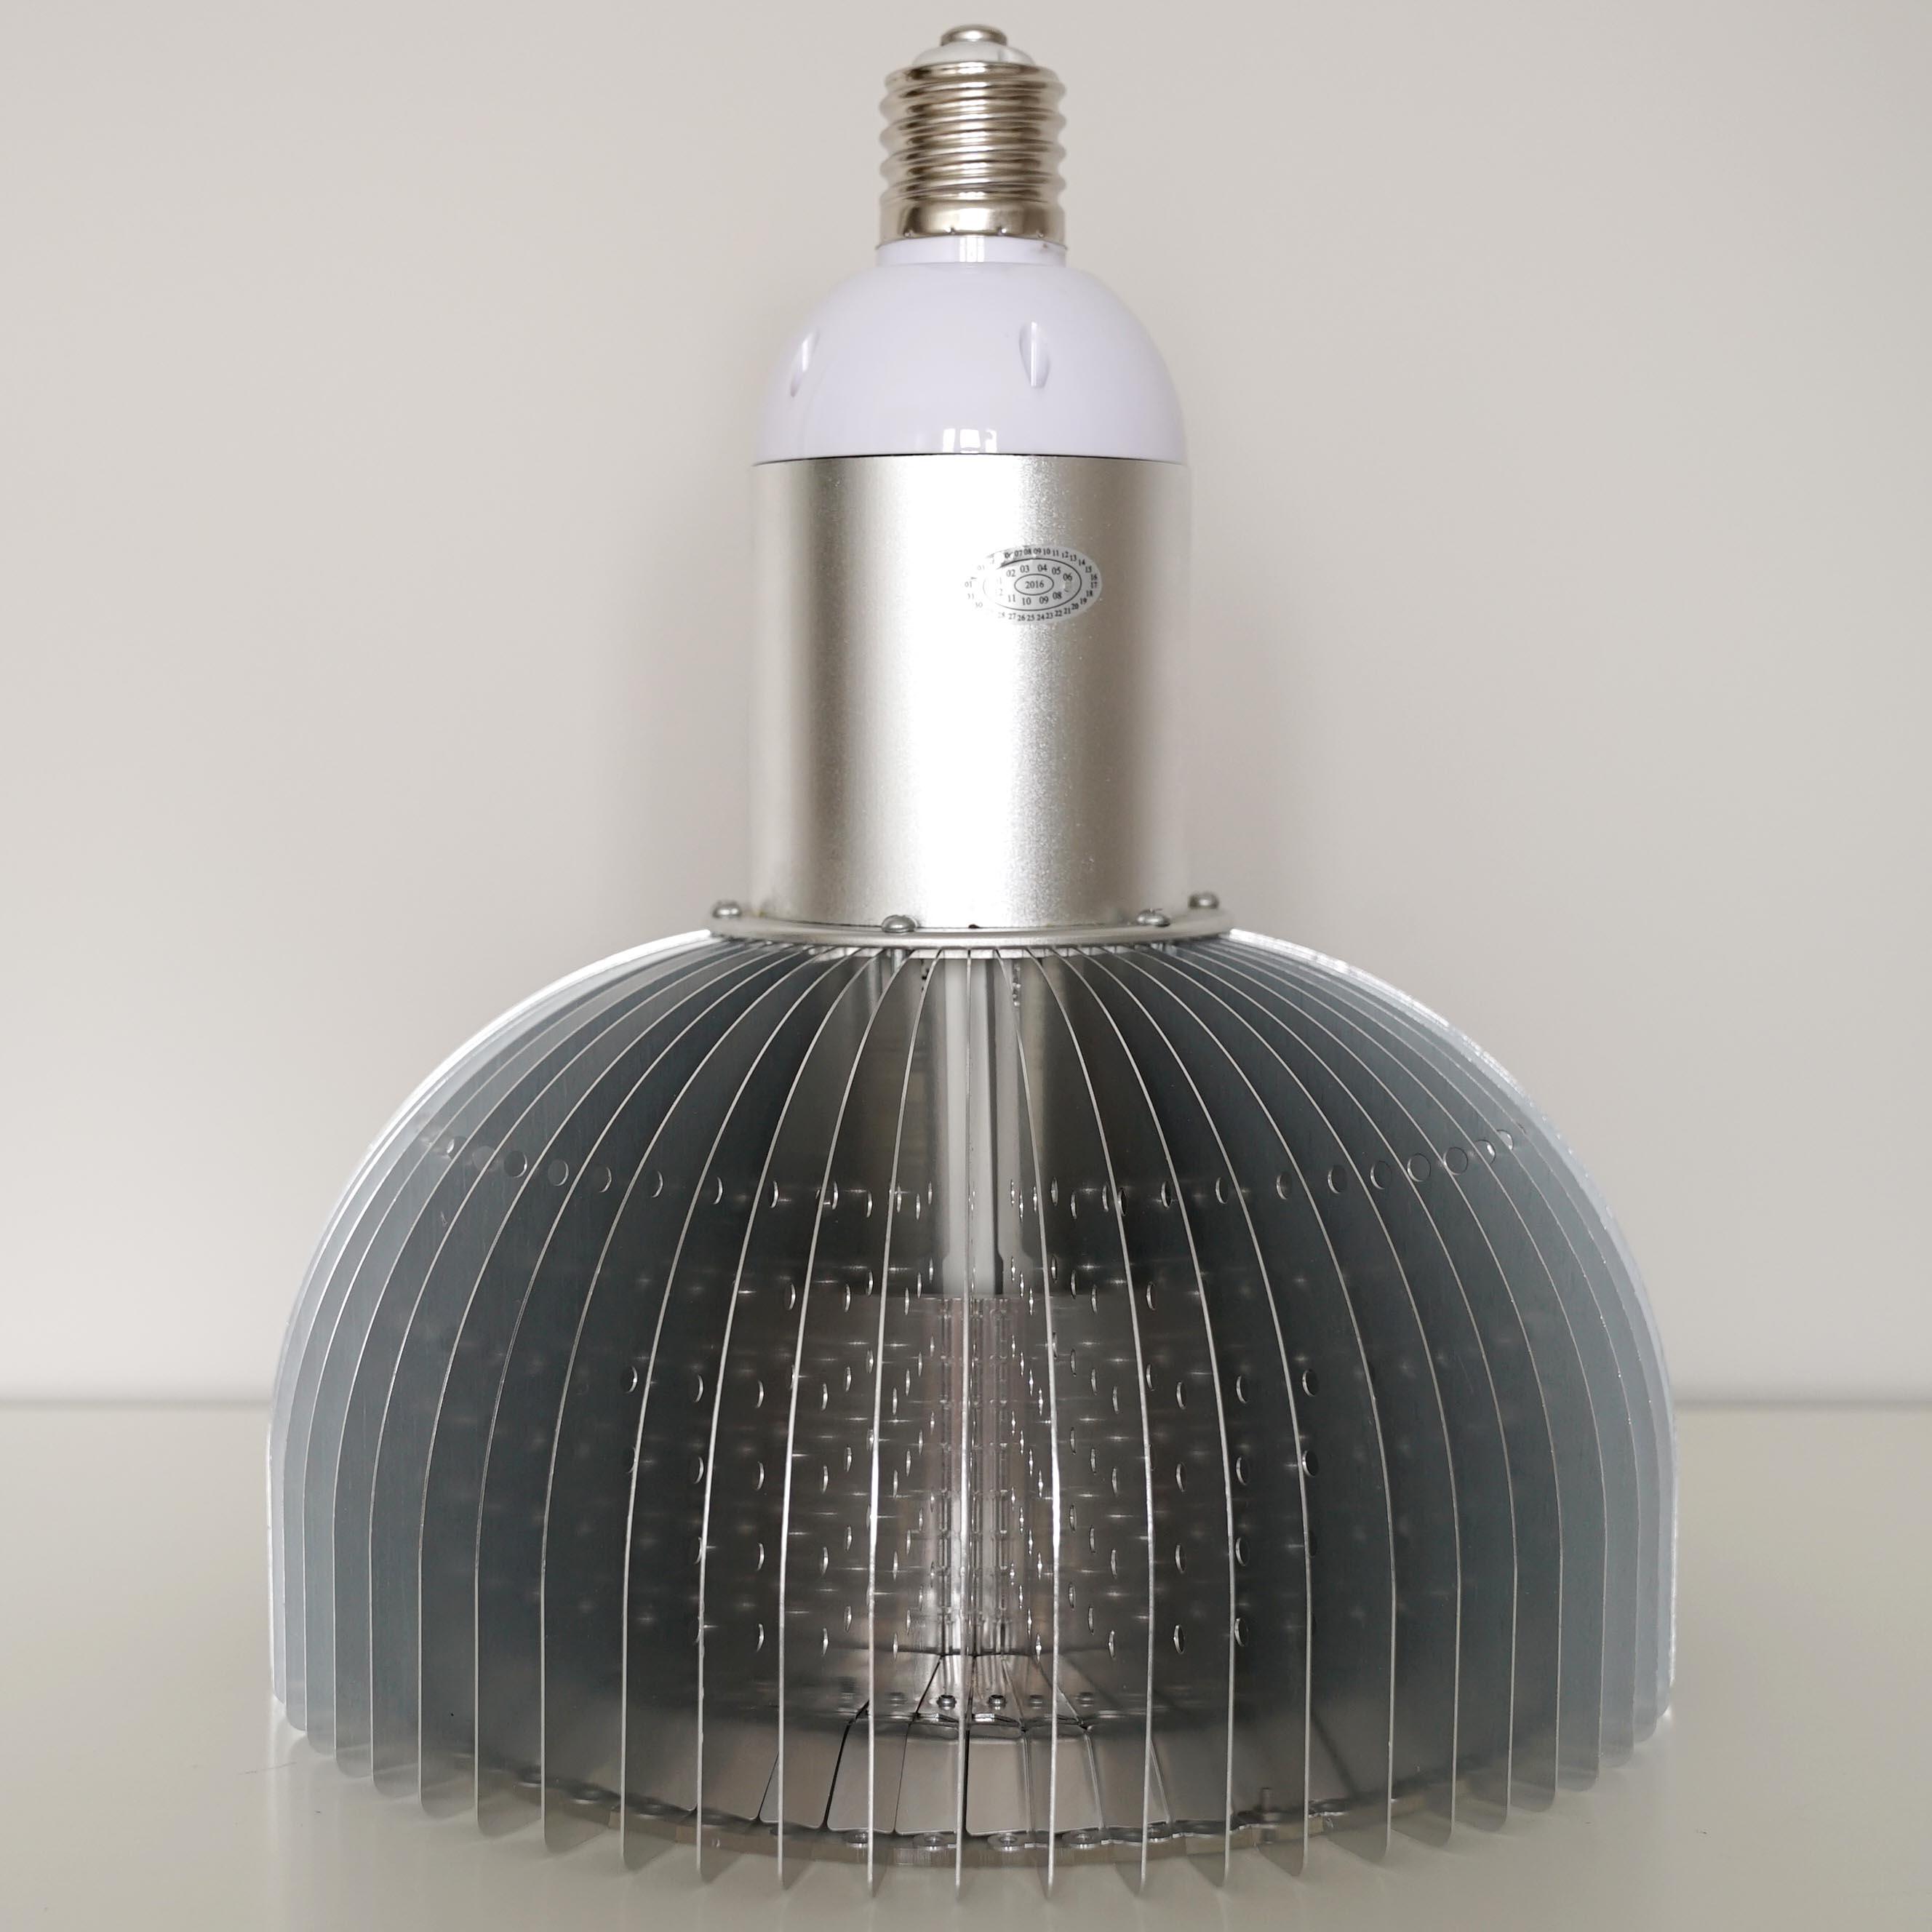 Par 95 LED Grow Light